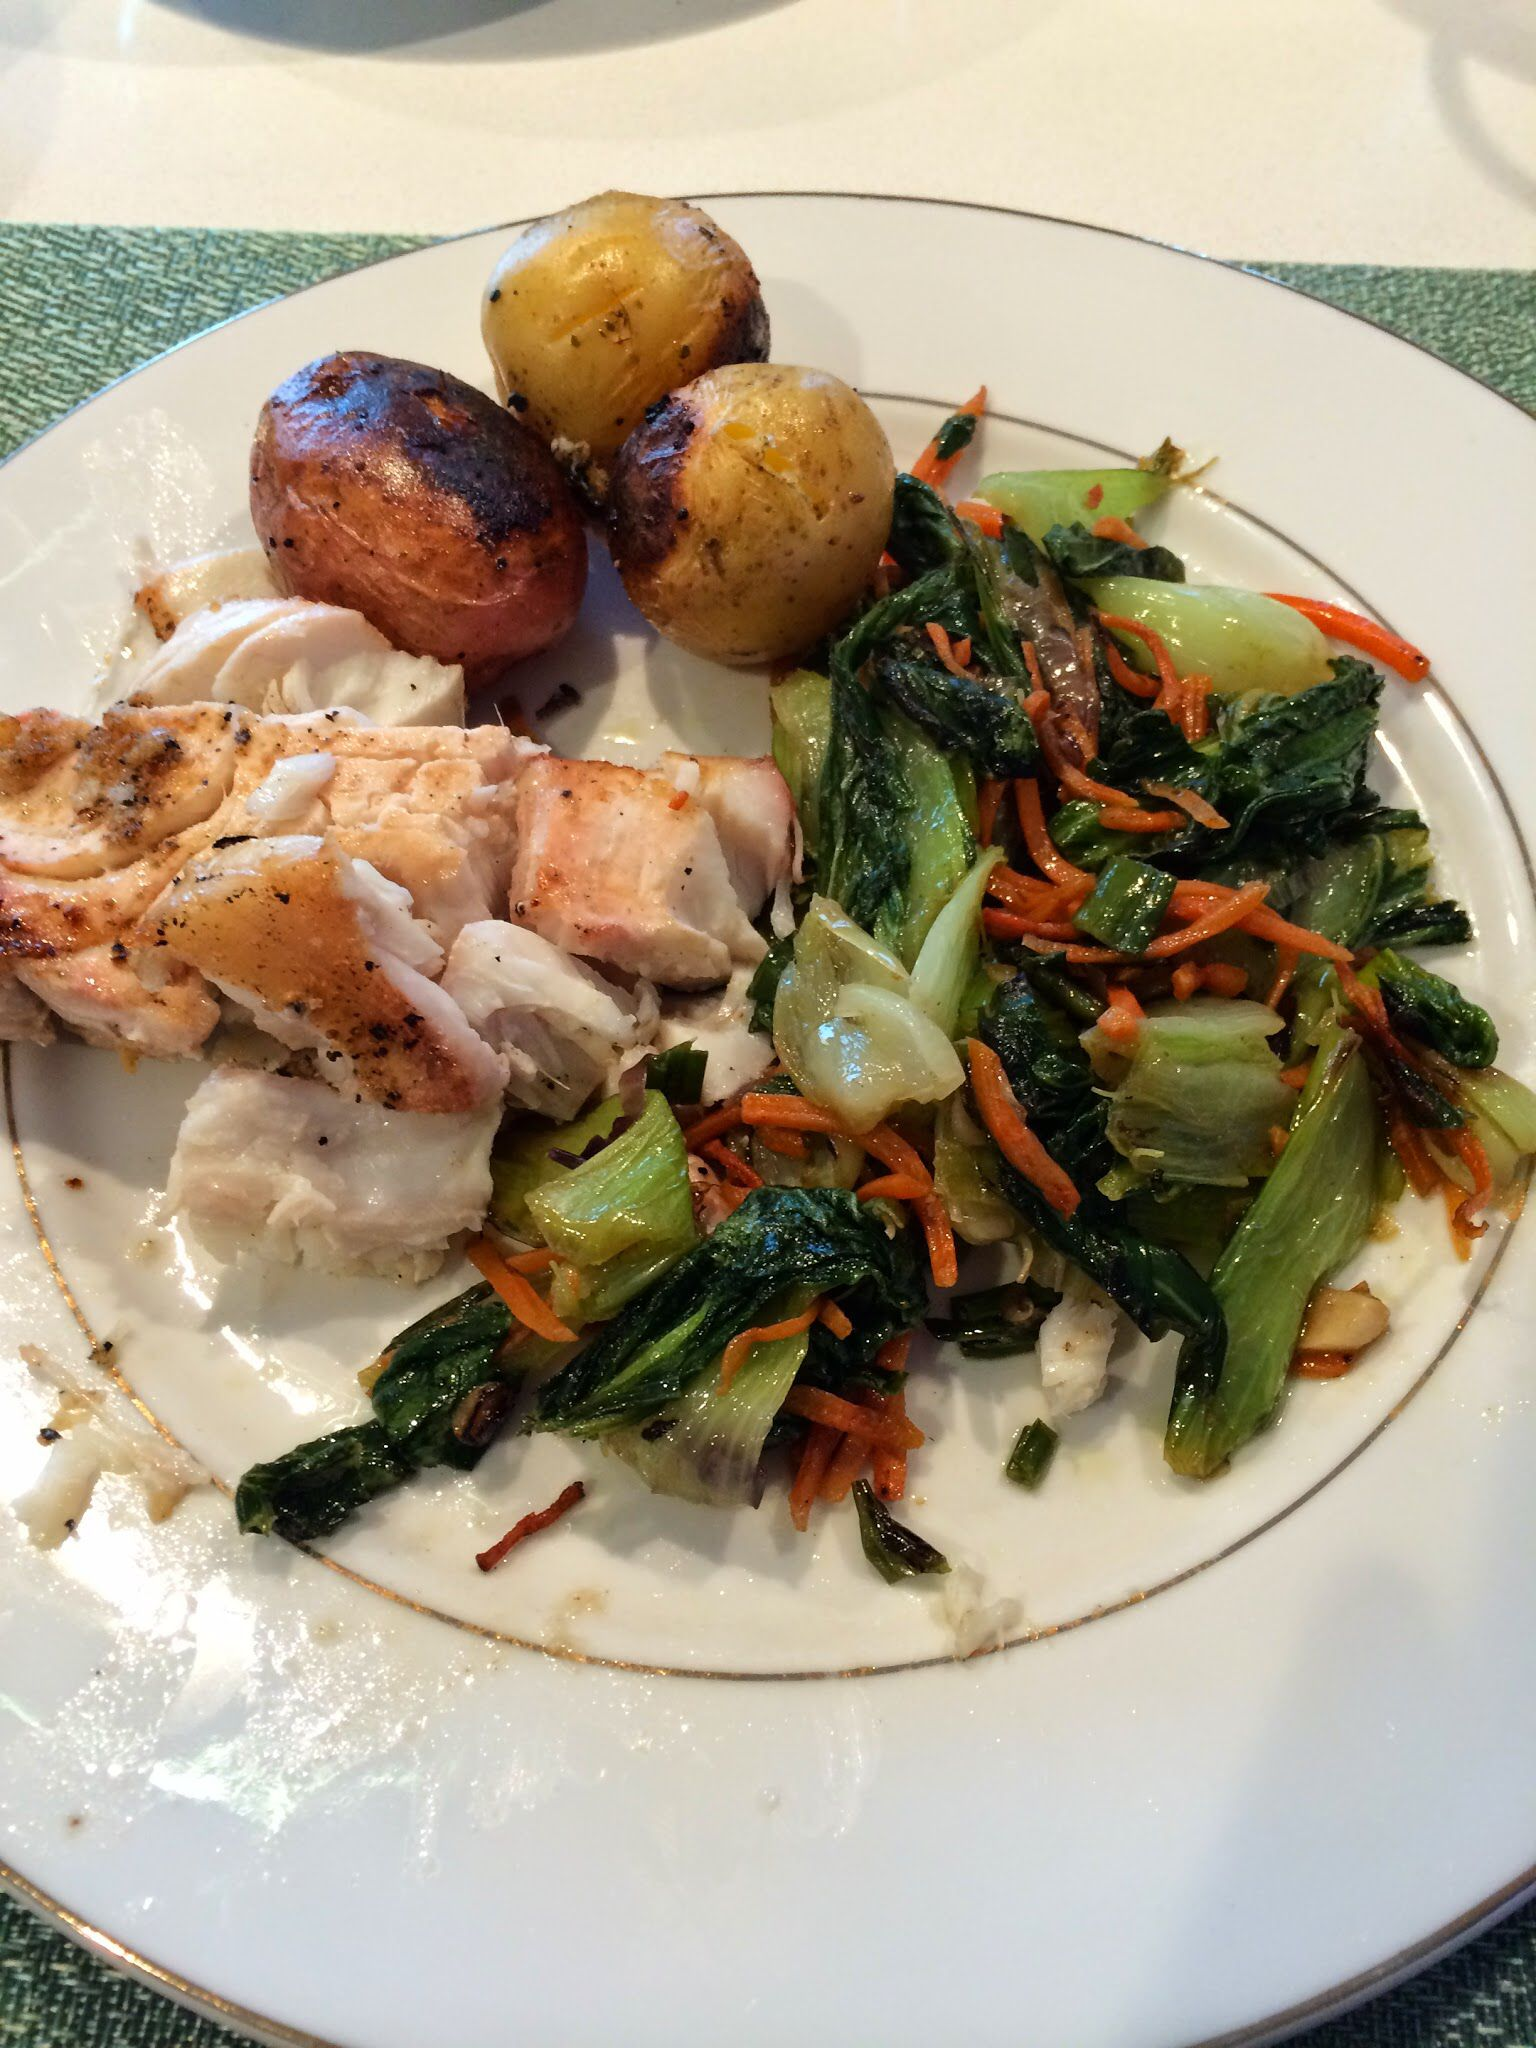 Grilled fish plus CSA vegetables